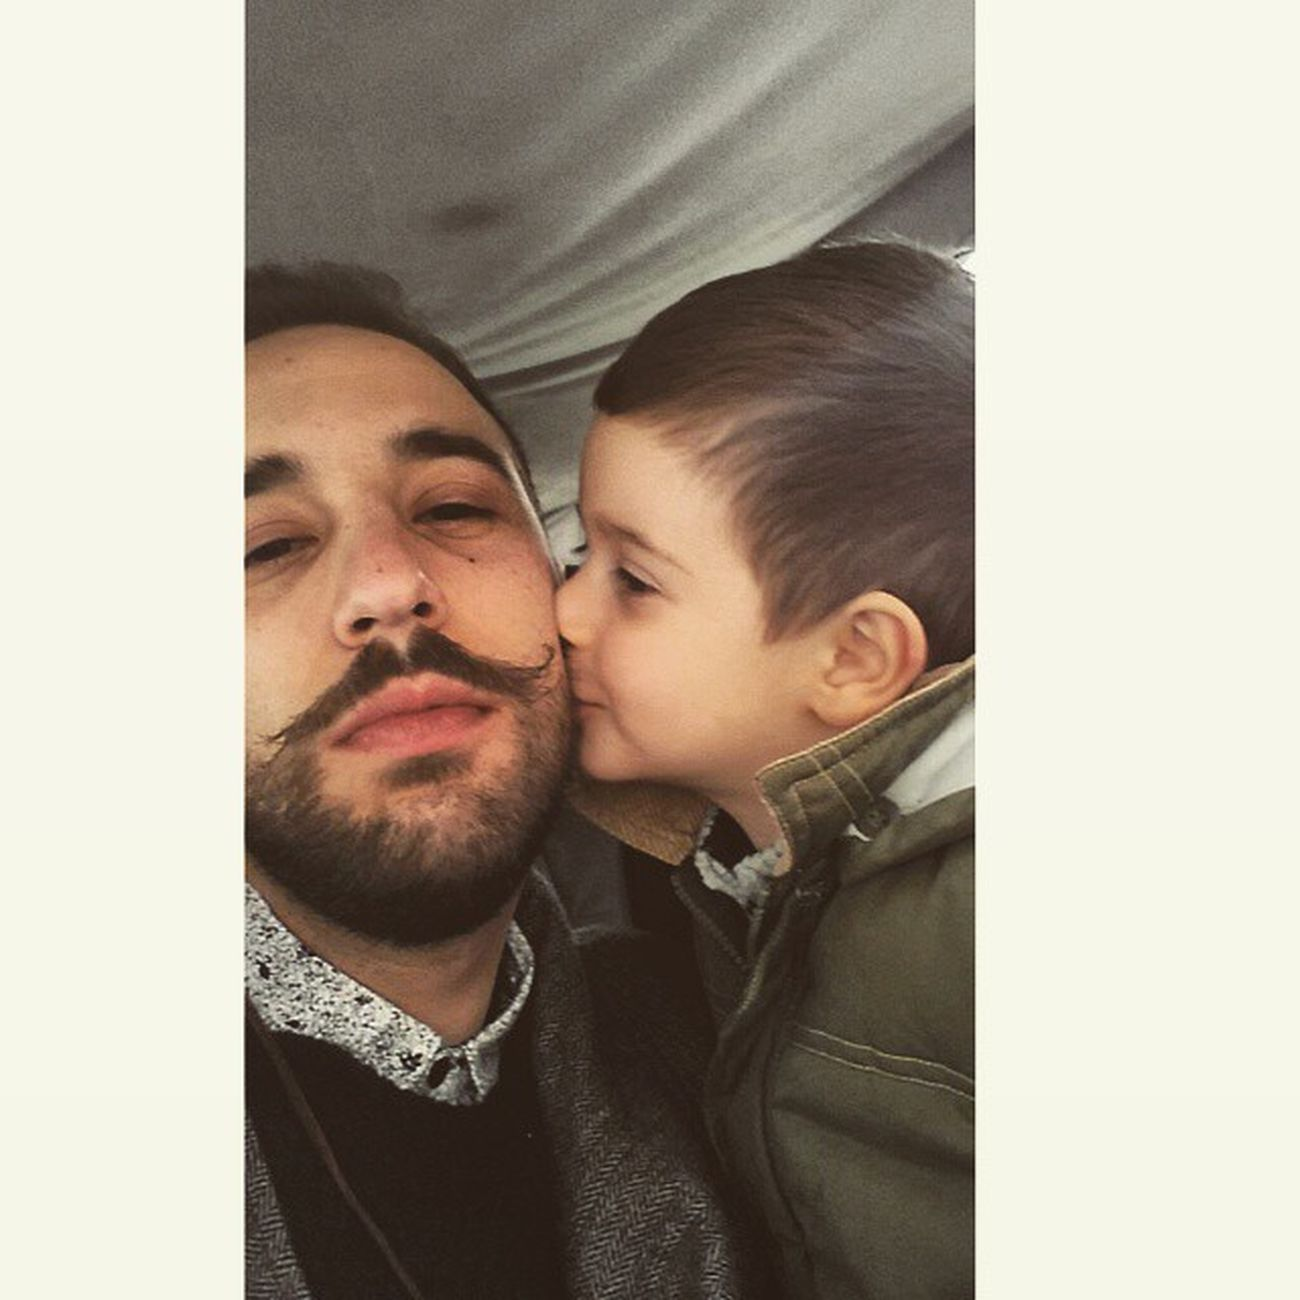 Love Vita Piccolomio Nipote 100happydays Casa Bacio  Styleoflife Me All Tagsforlike AndroidPhotography Stateofmind Jj